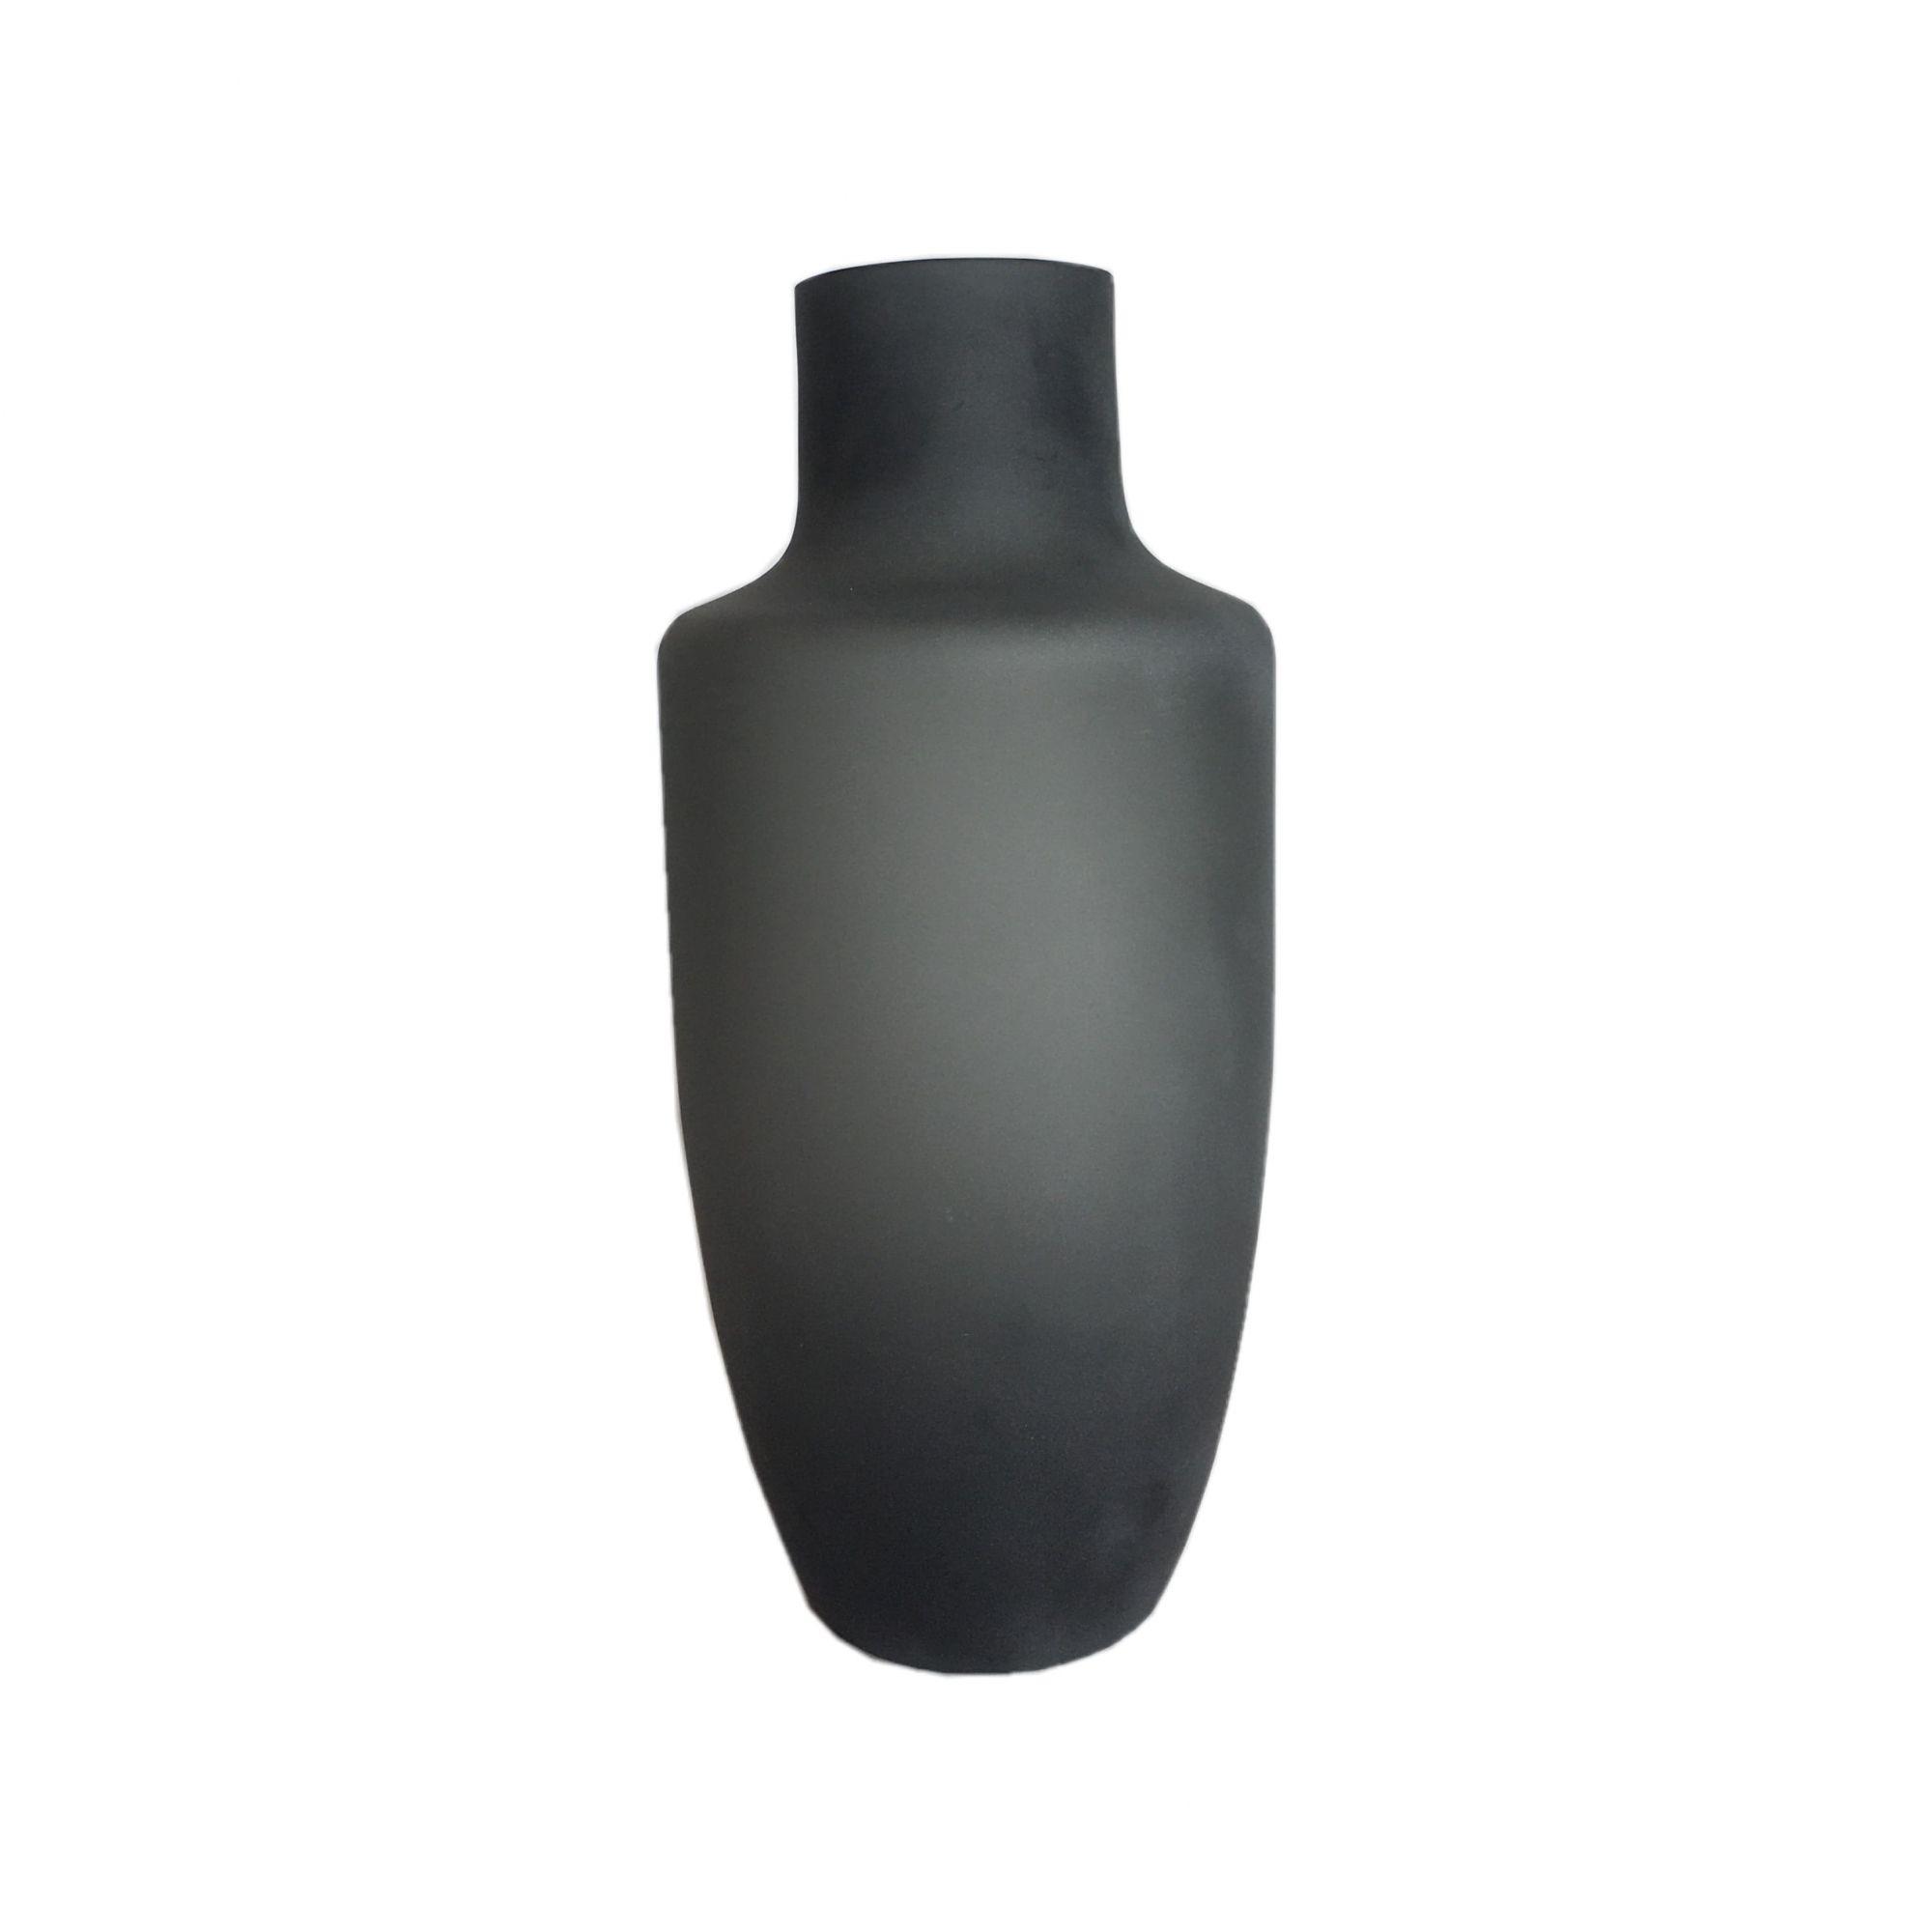 Vaso Cinza em Vidro